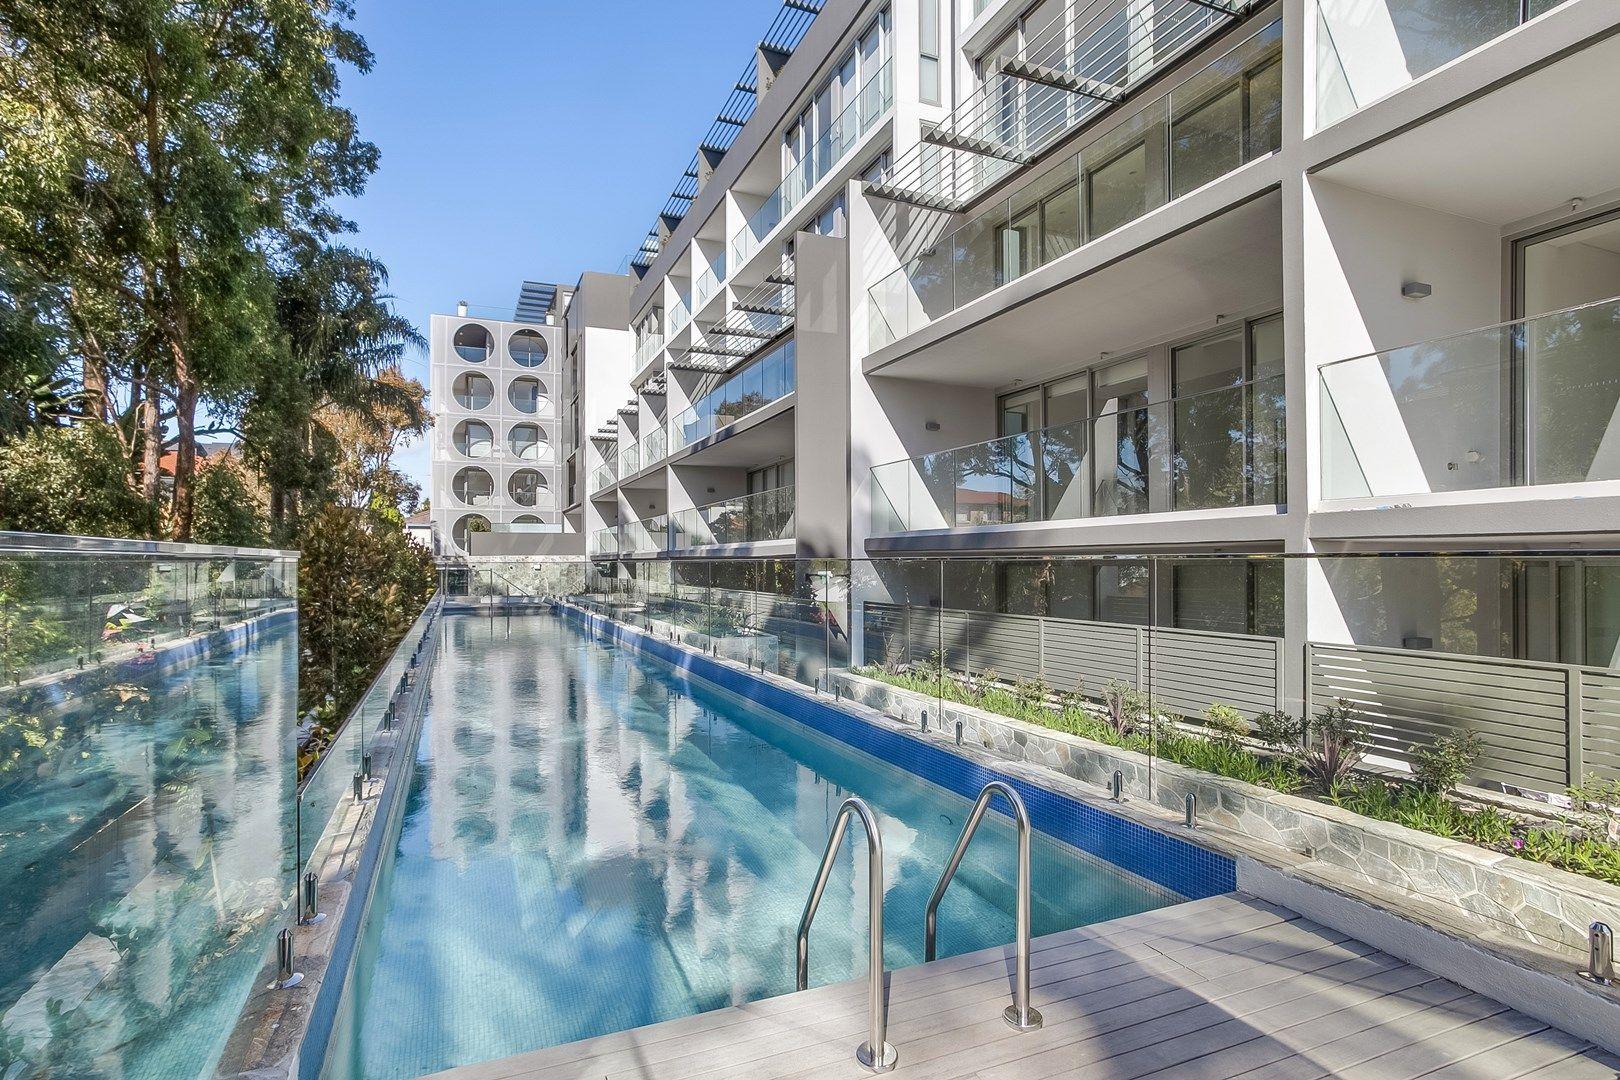 2 bedrooms Apartment / Unit / Flat in 619/84-108 Anzac Parade KENSINGTON NSW, 2033